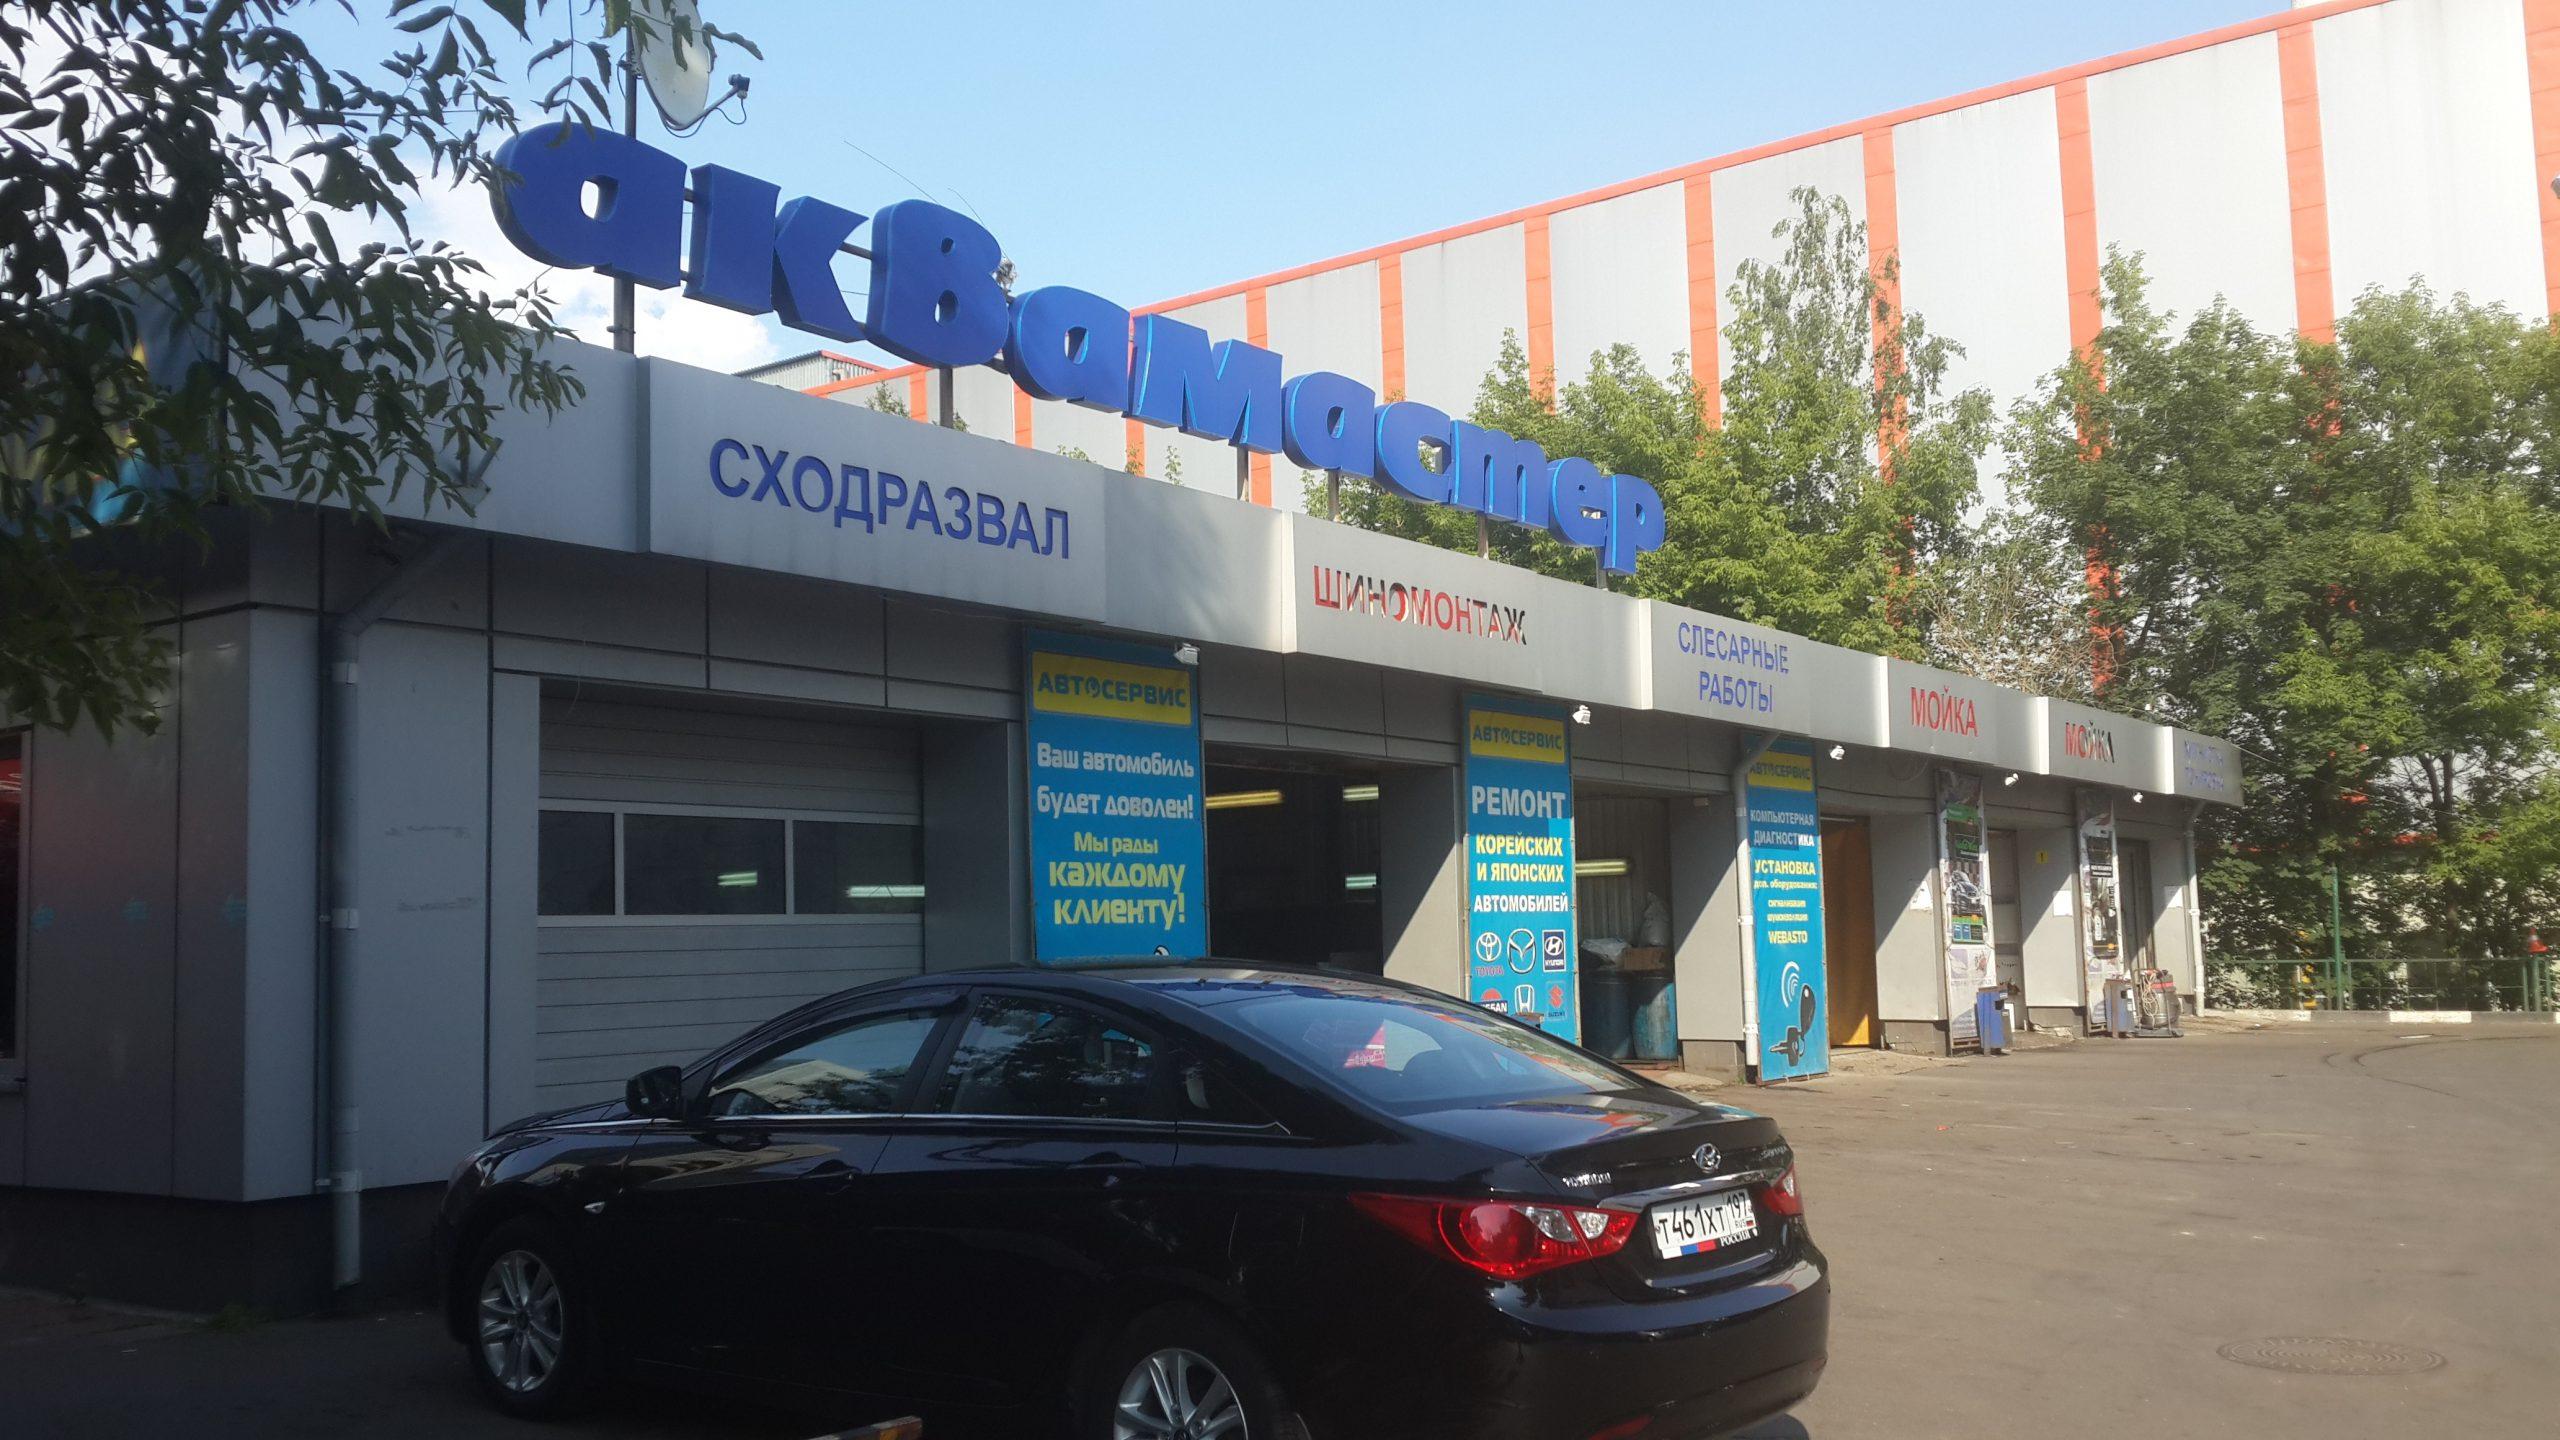 ИП Горшков Андрей Николаевич